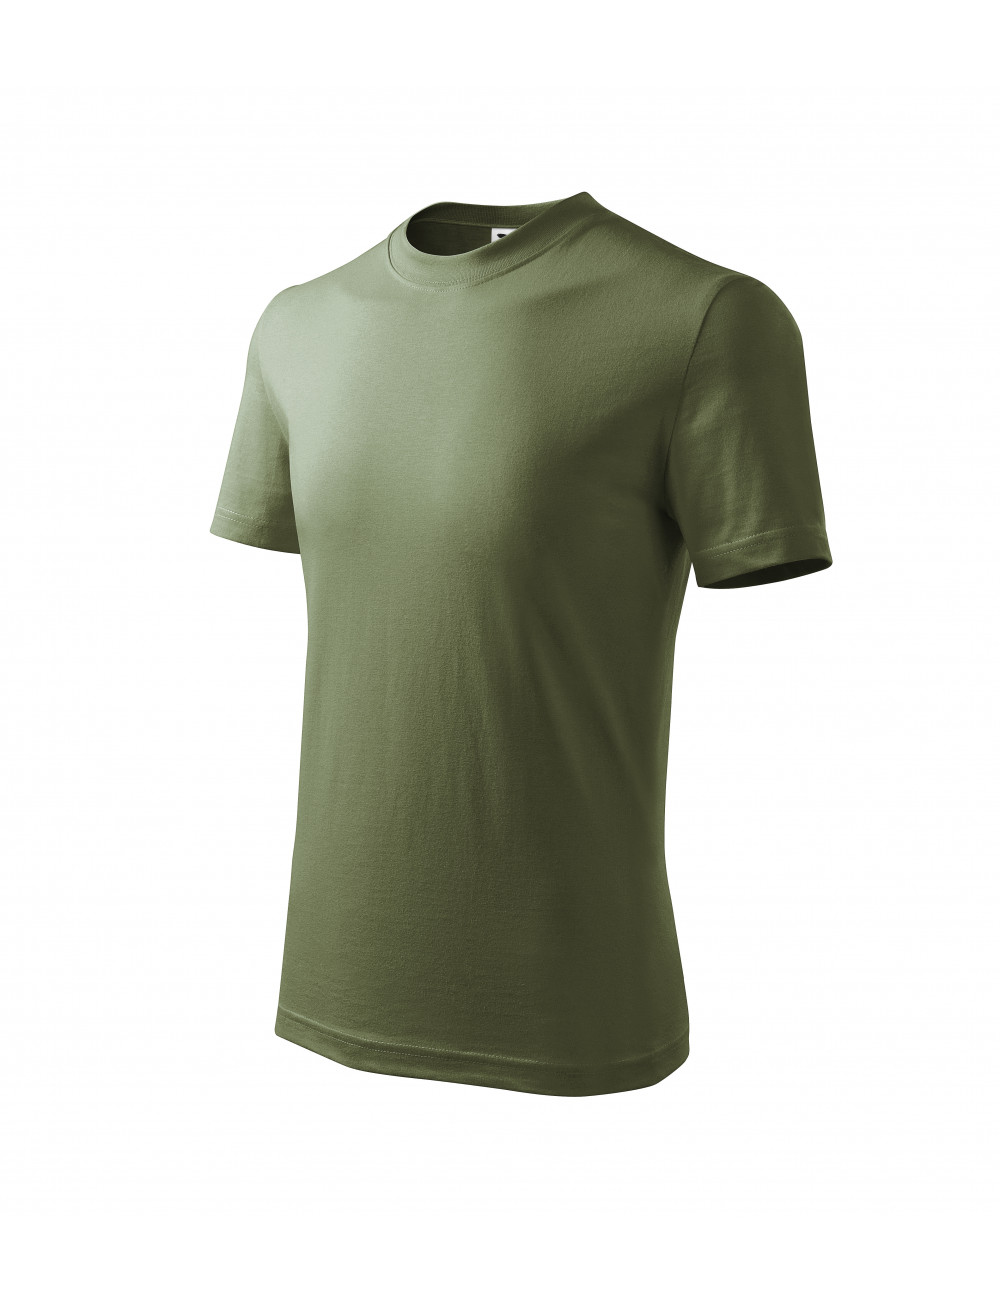 Adler MALFINI Koszulka dziecięca Basic 138 khaki